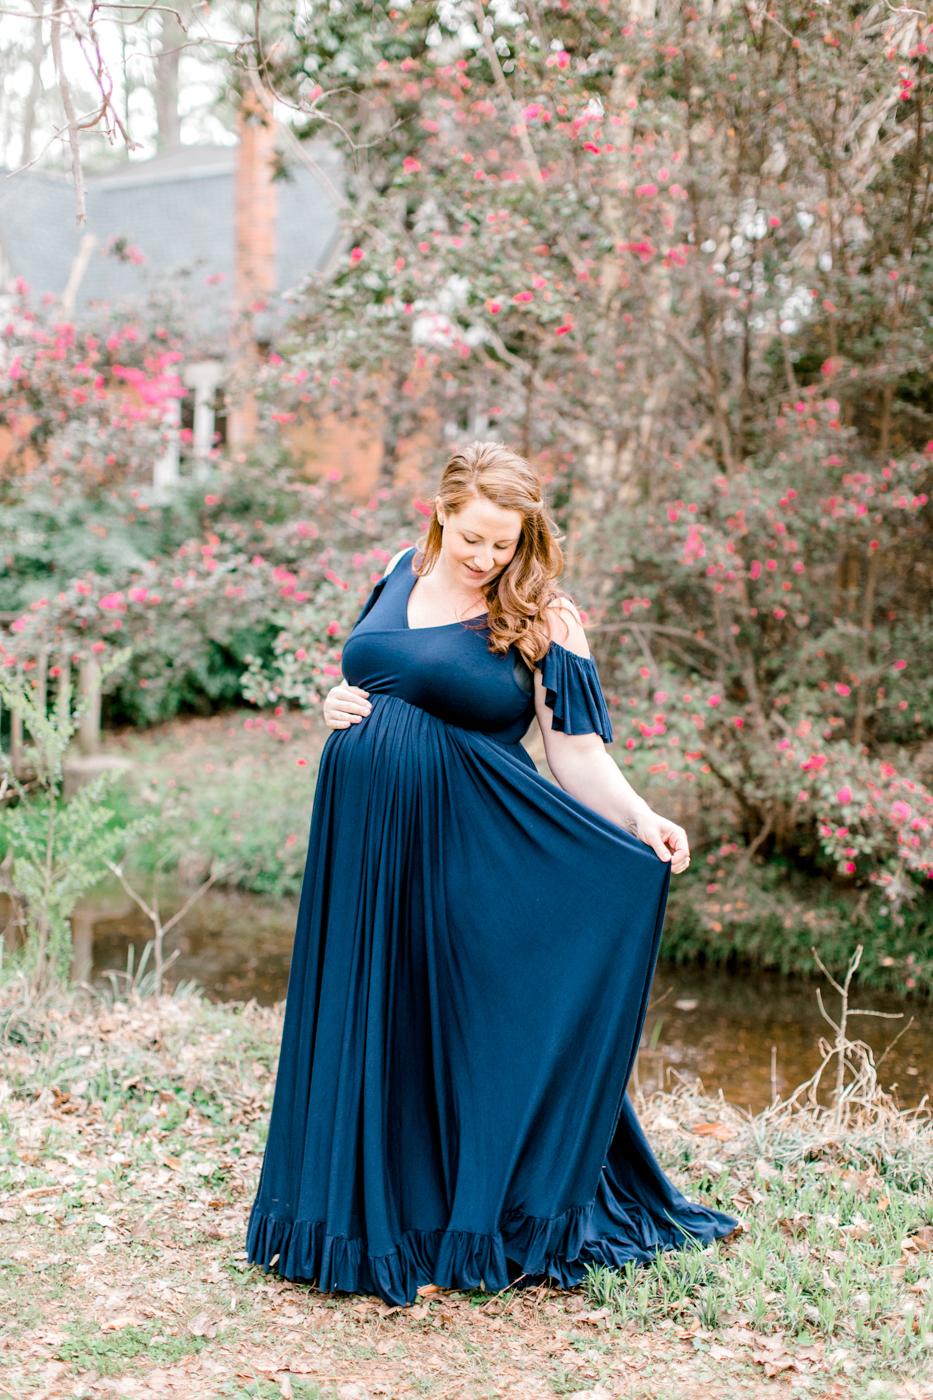 spring maternity session atlanta newborn photographer atlanta newborn photography maternity photography four corners photography lily lauren williams maternity session avondale estates (31 of 34).jpg